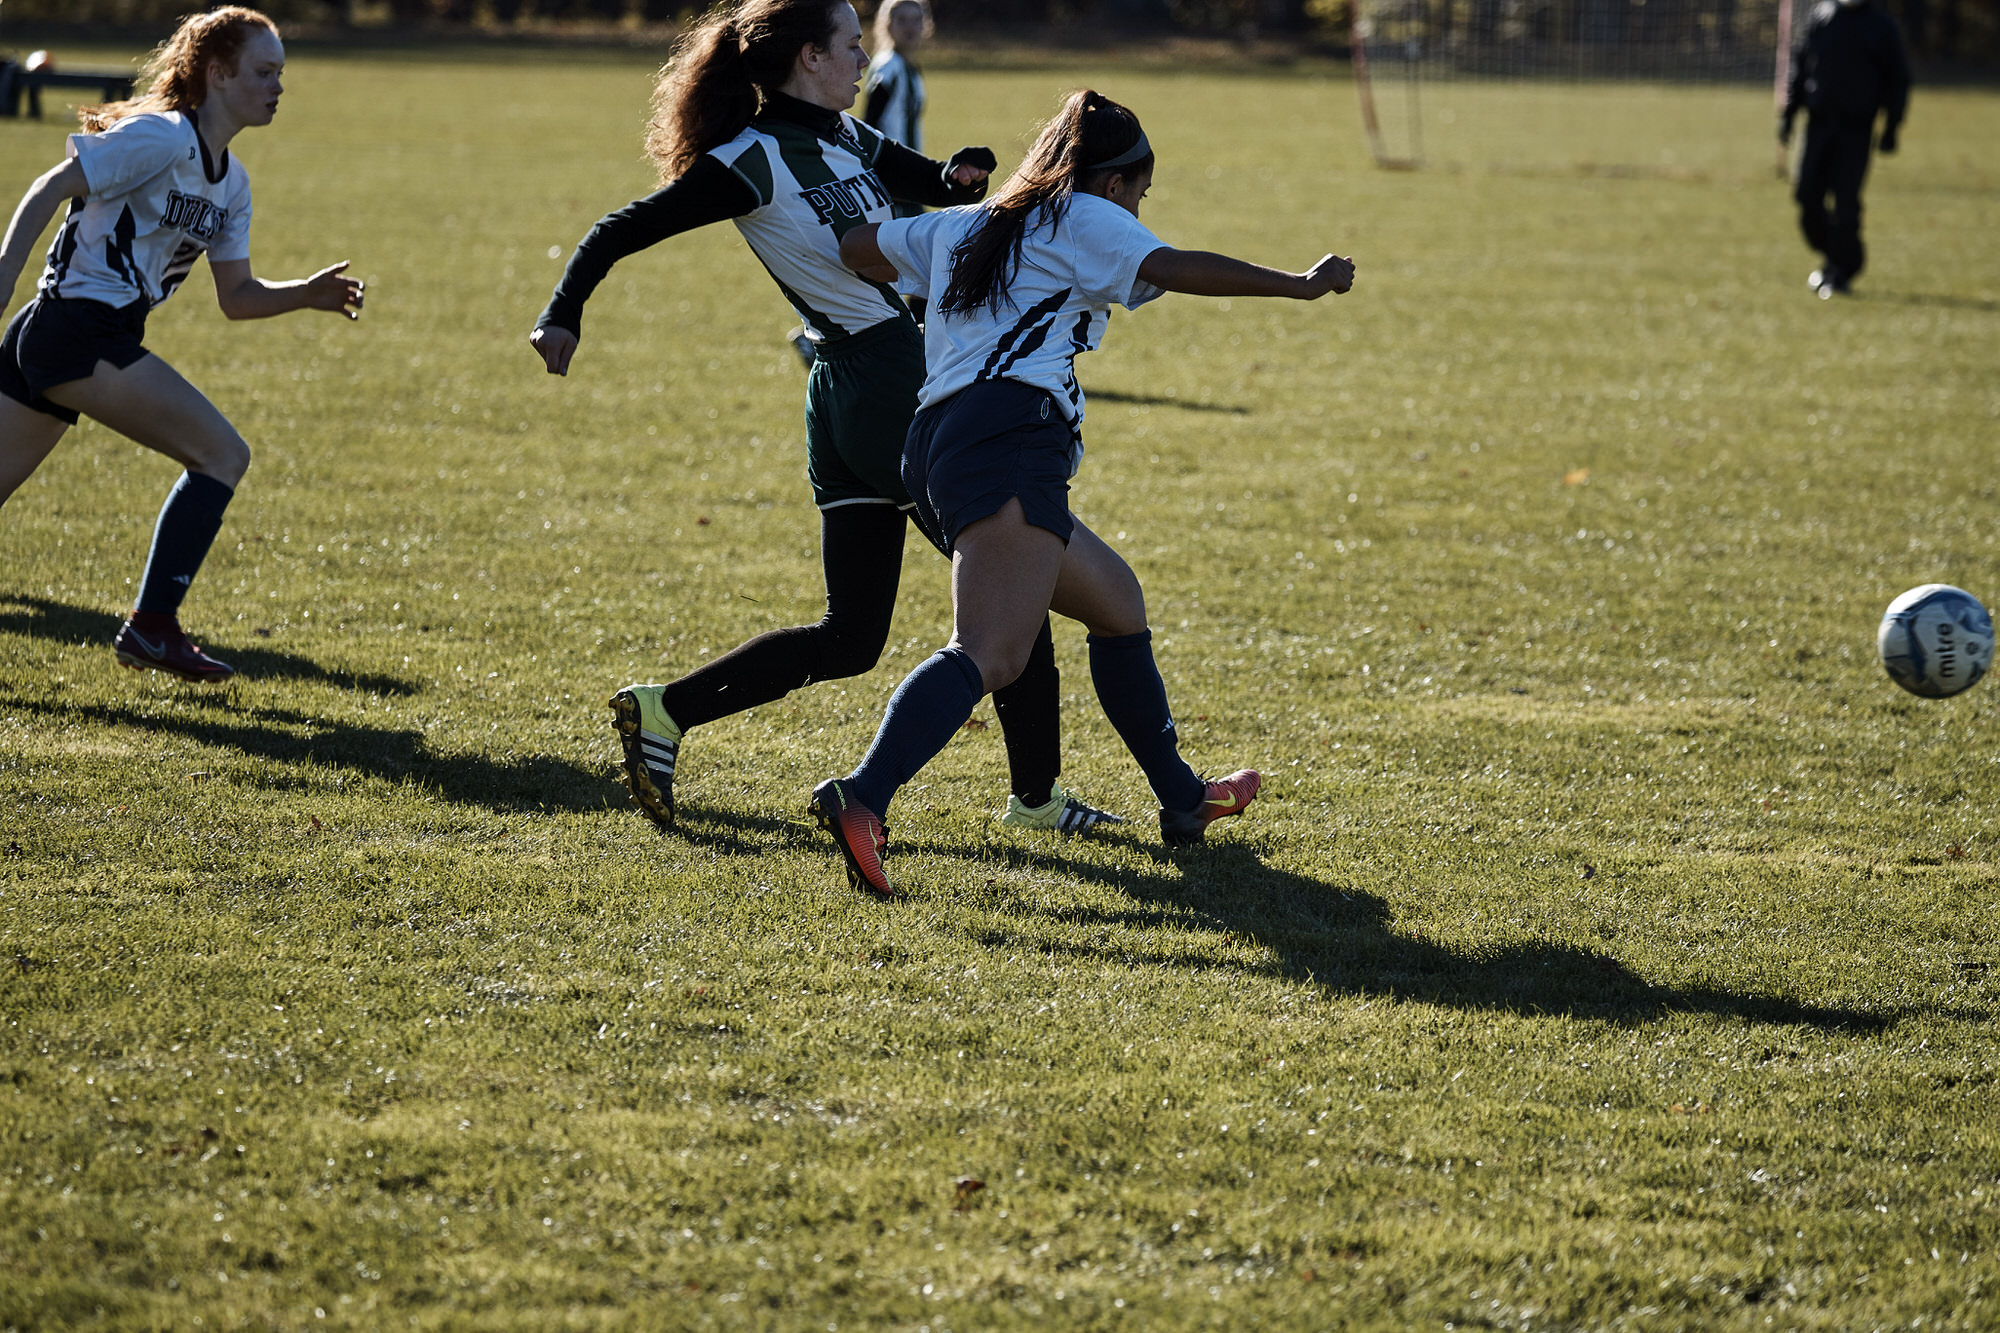 Girls Varsity Soccer vs. Putney School - October 26, 2018 - 011.jpg